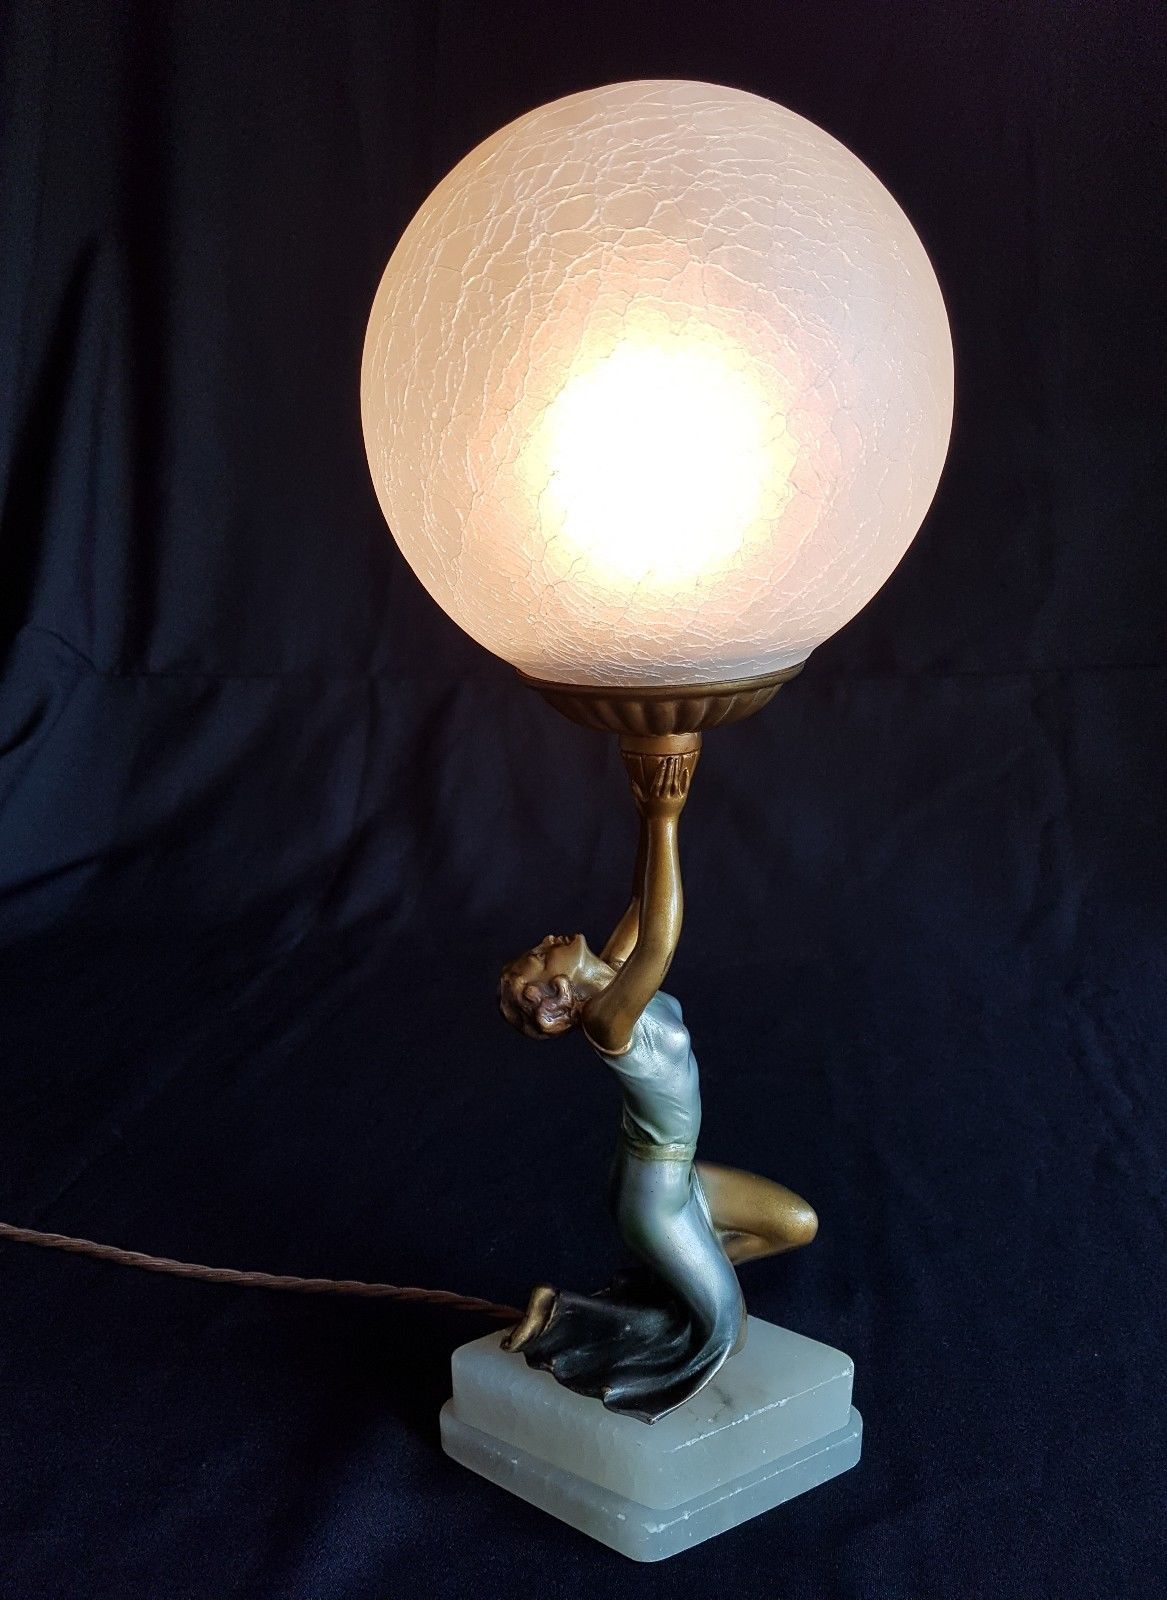 Art Deco lady figure lamp Lorenzl Art deco lamps, Art